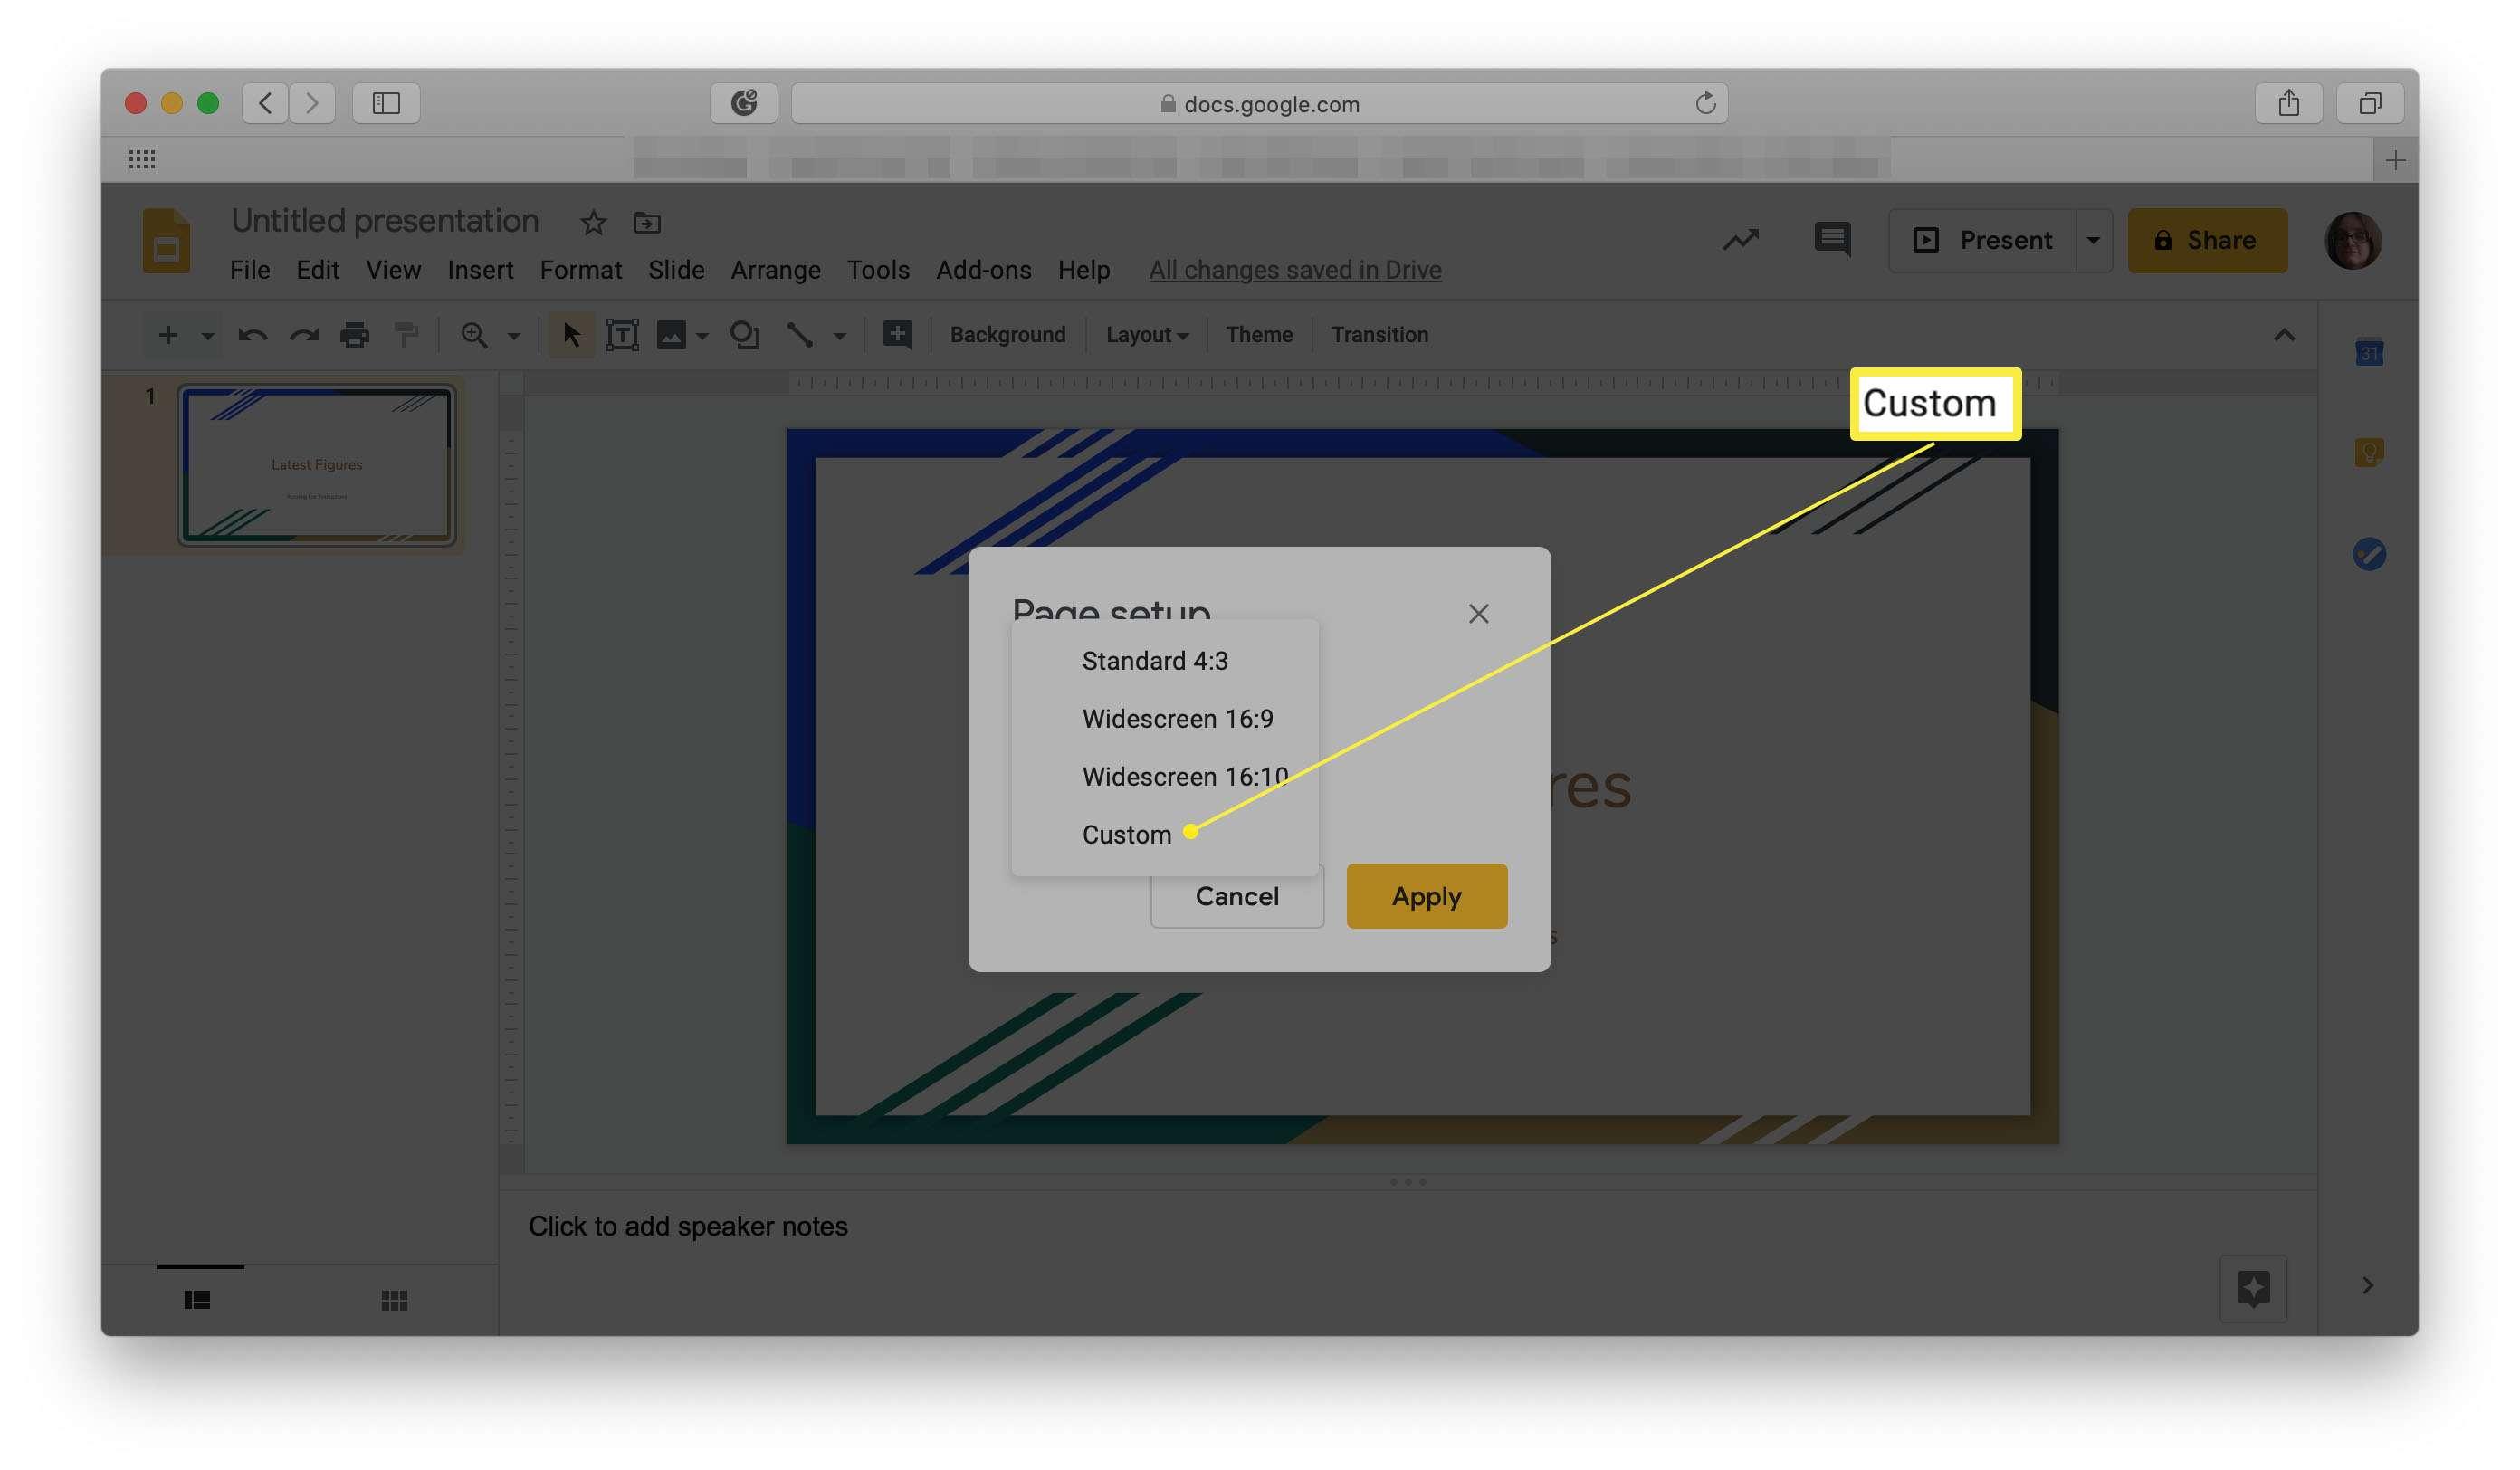 Google Slides Custom page setup highlighted